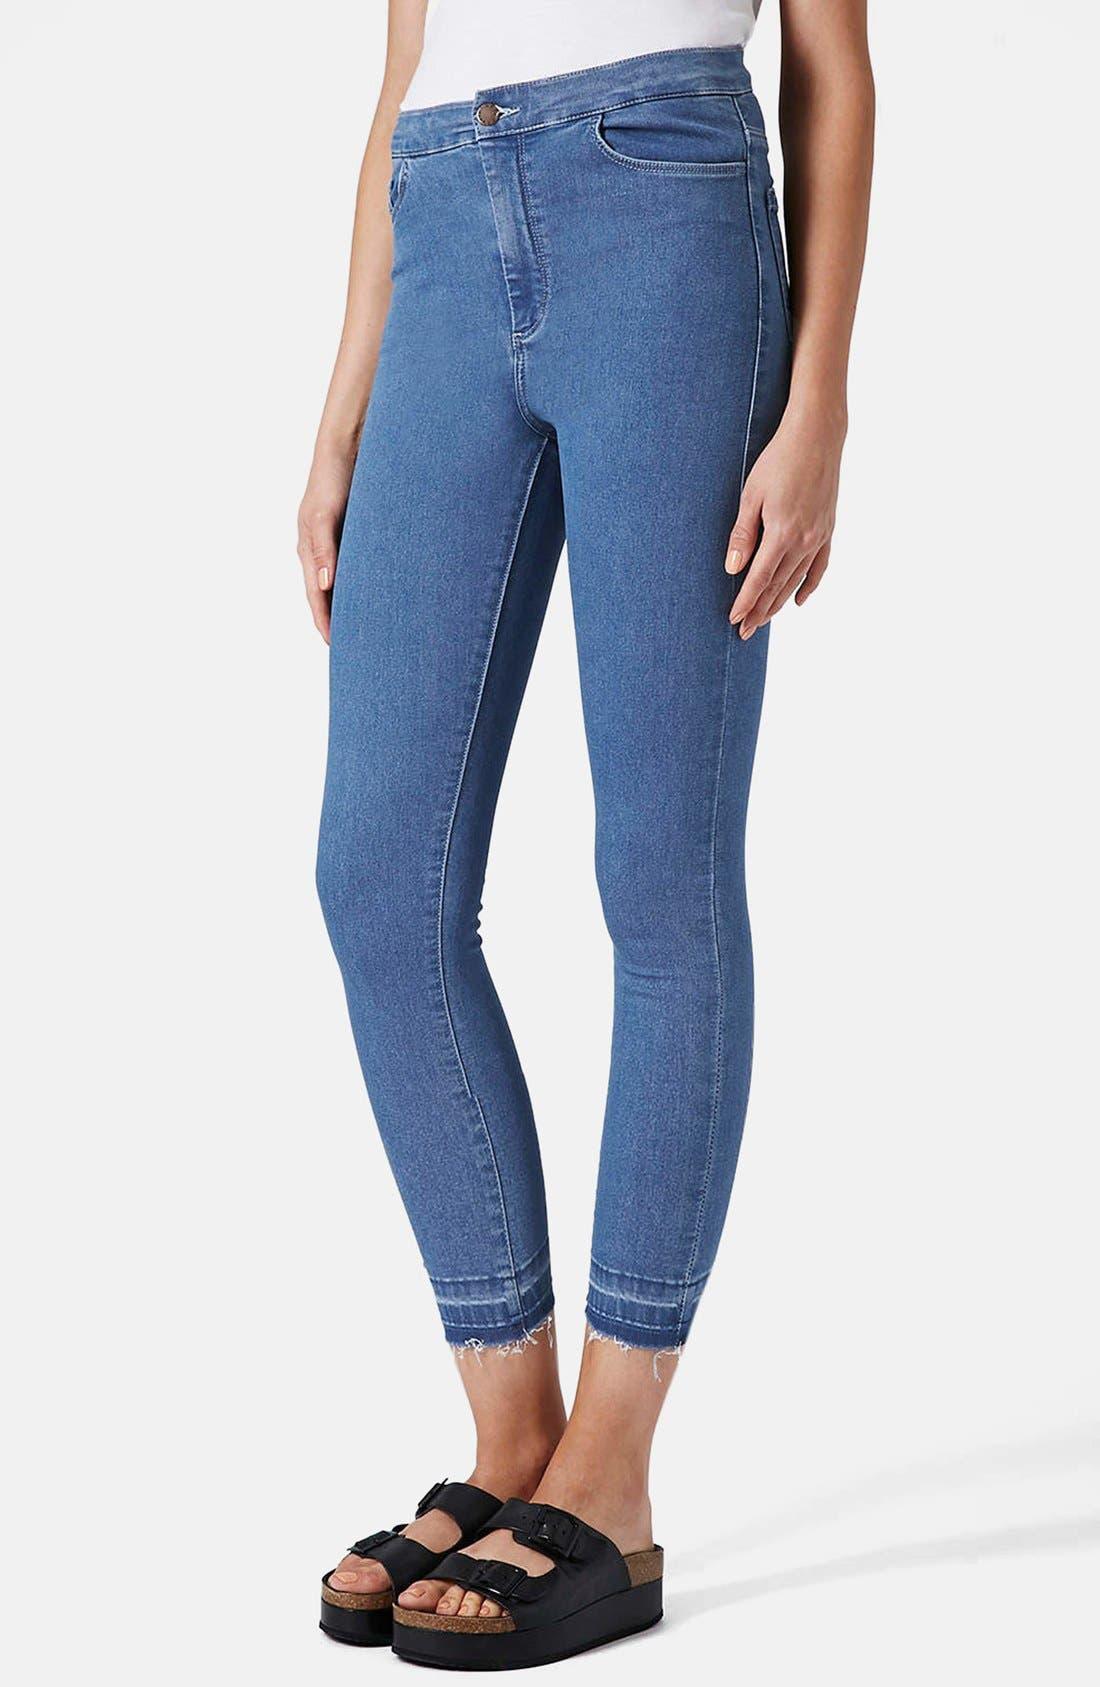 Alternate Image 1 Selected - Topshop Moto 'Joni' High Rise Crop Skinny Jeans (Light)